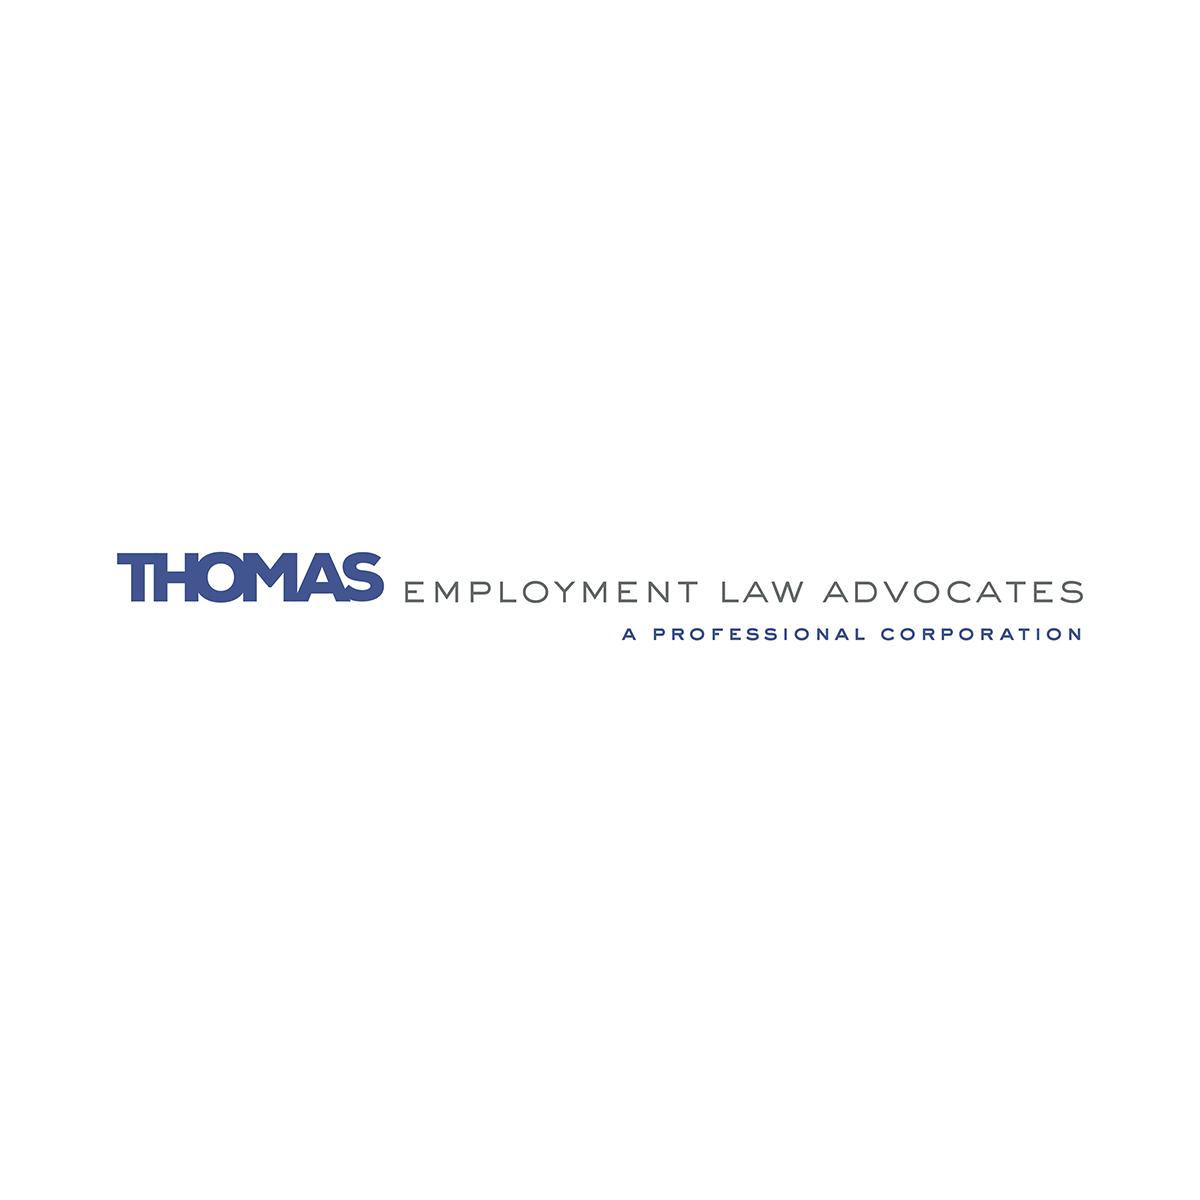 Thomas Employment Law Advocates